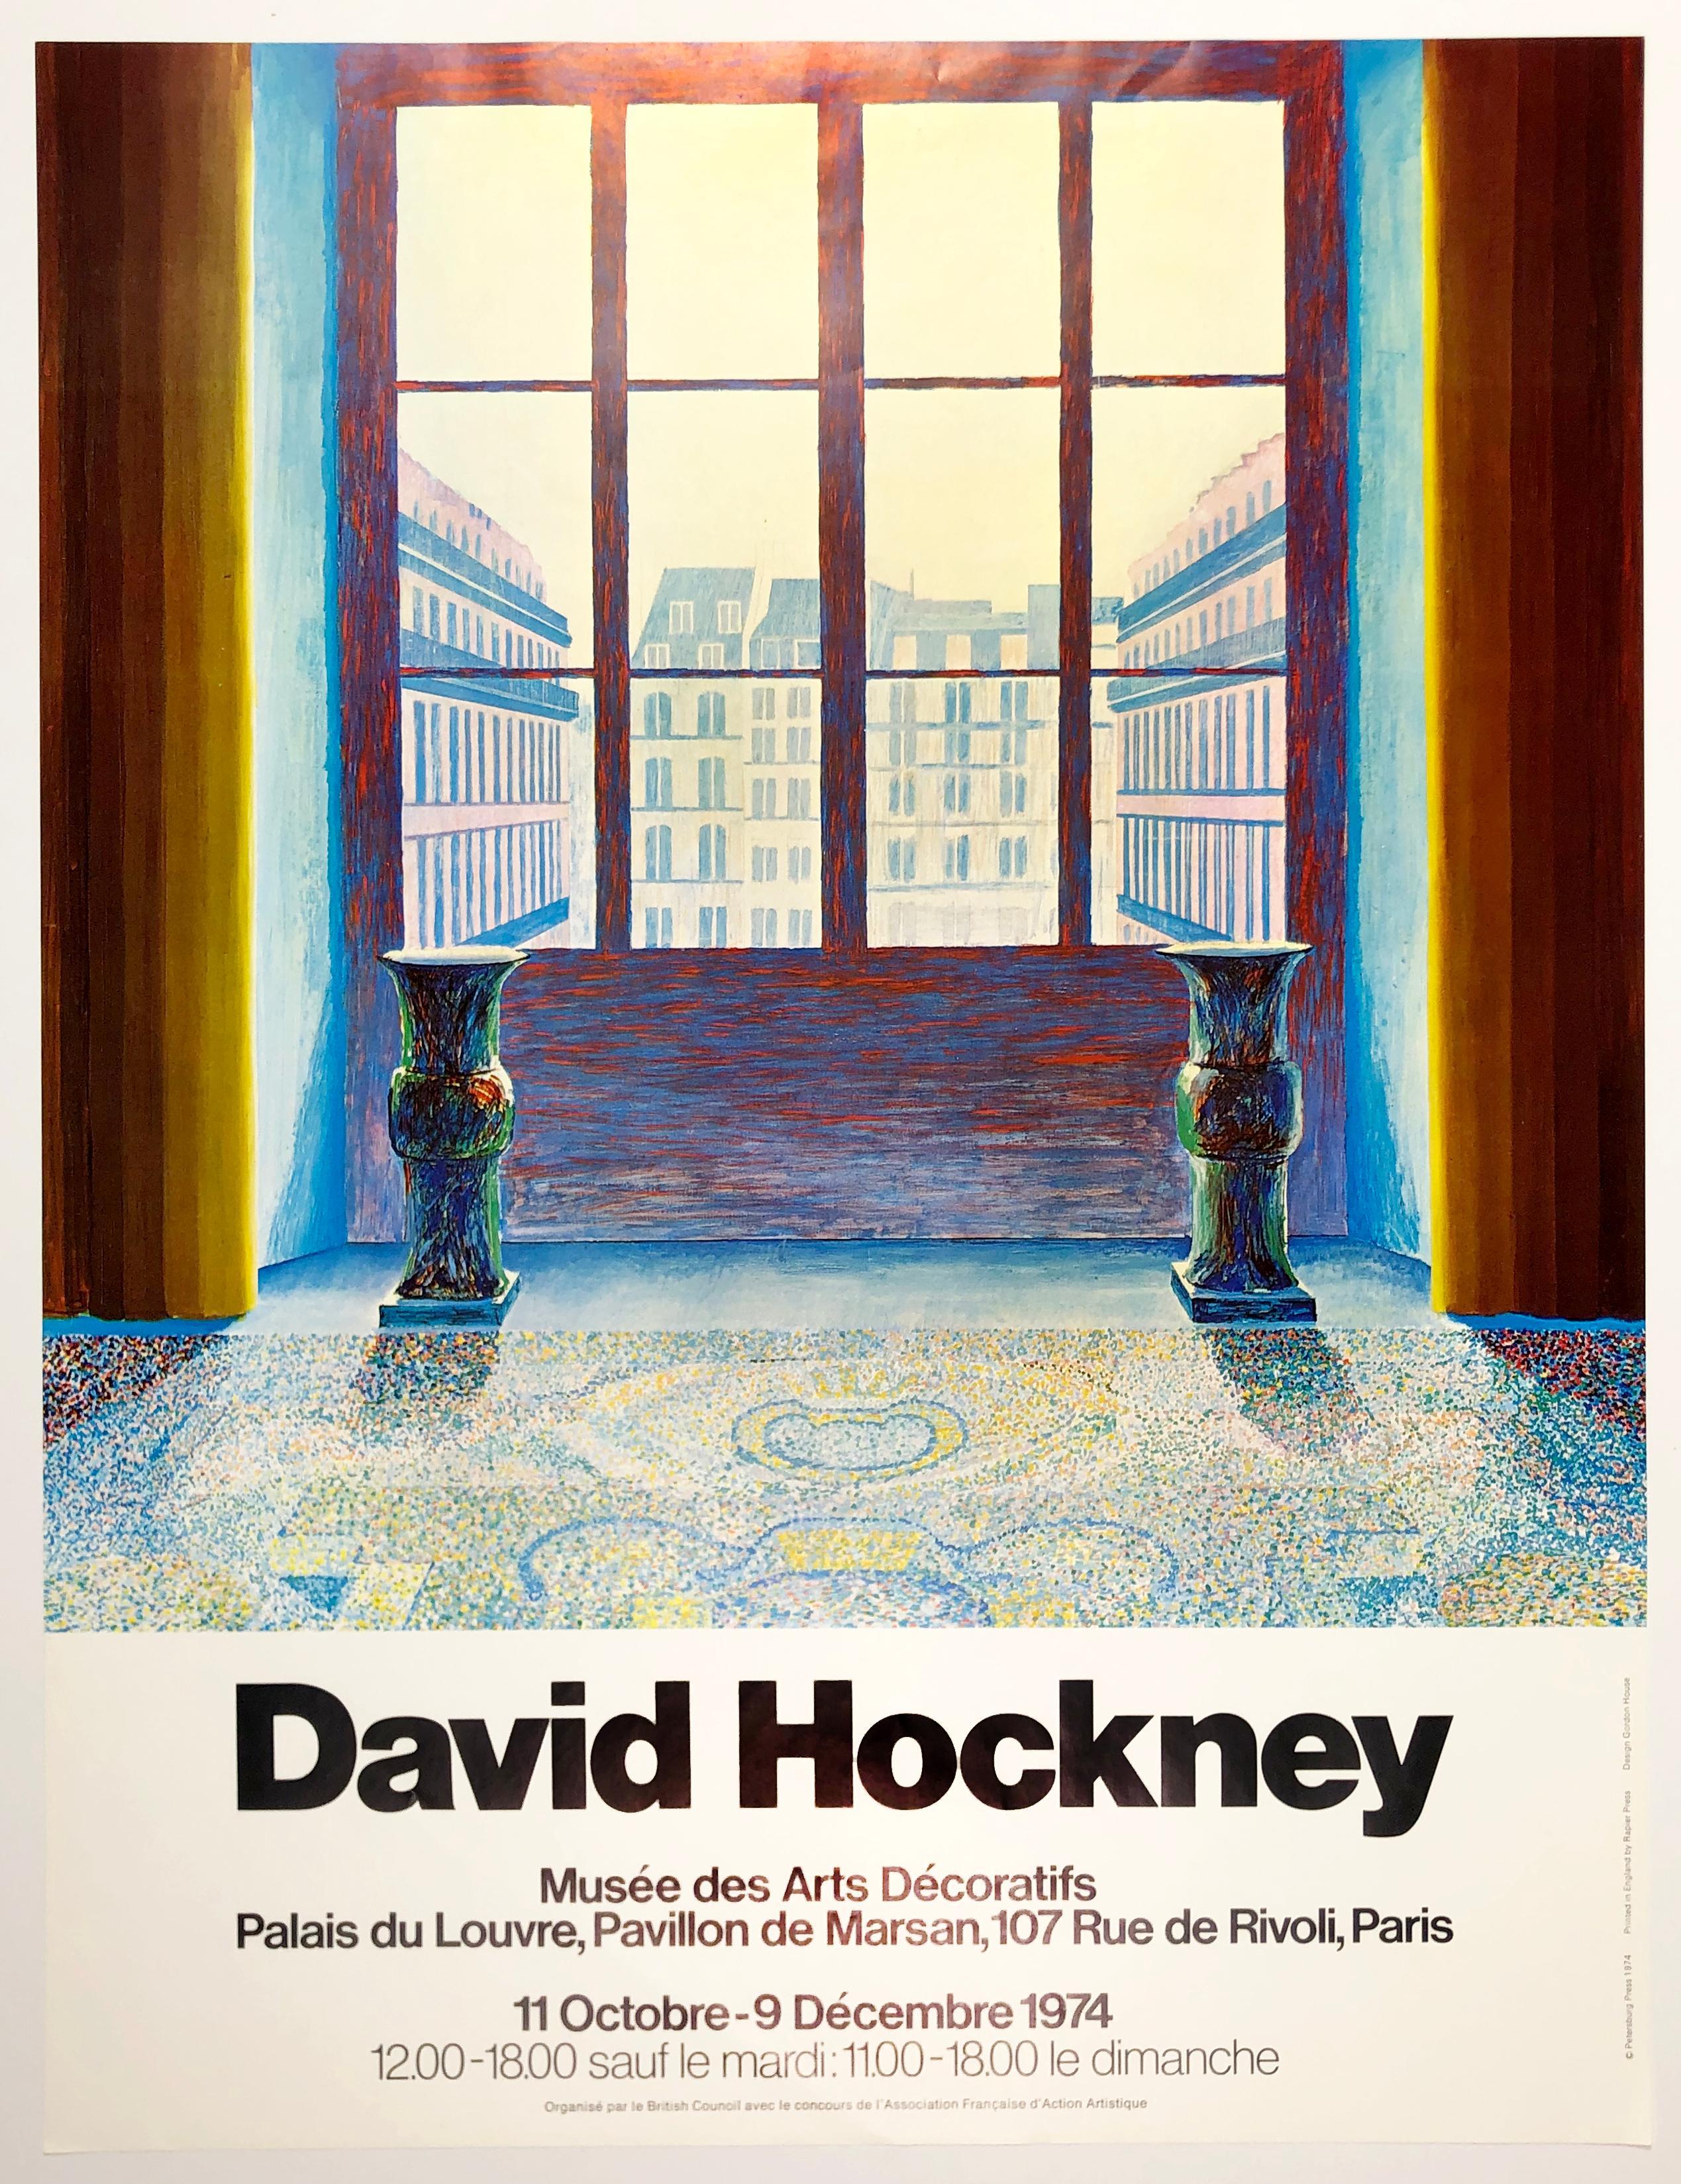 Vintage Hockney poster Musée des Arts Decoratifs Paris 1974